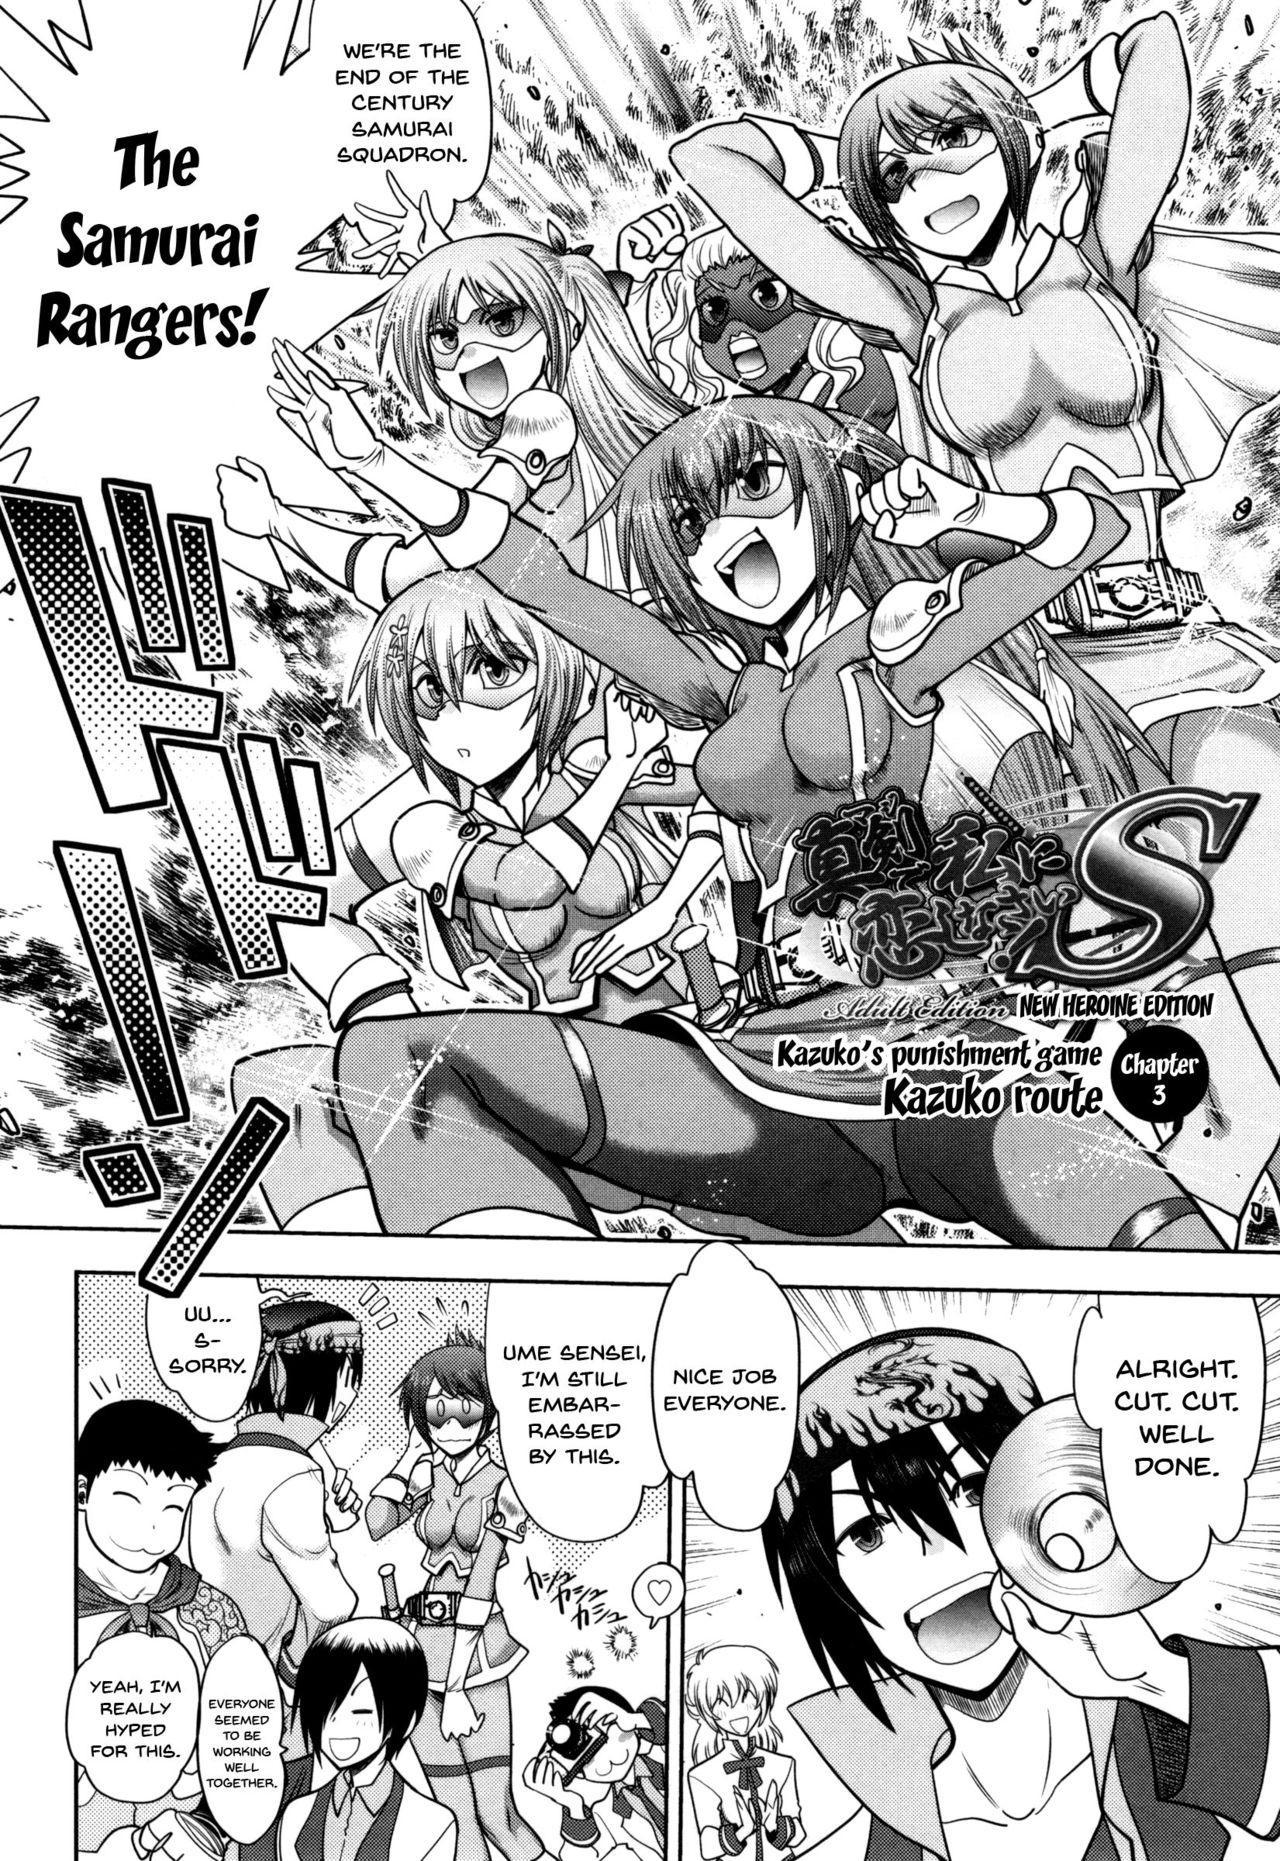 [Yagami Dai] Maji de Watashi ni Koi Shinasai! S Adult Edition ~Shodai Heroine Hen~ | Fall in Love With Me For Real! Ch.1-8 [English] {Doujins.com} 46